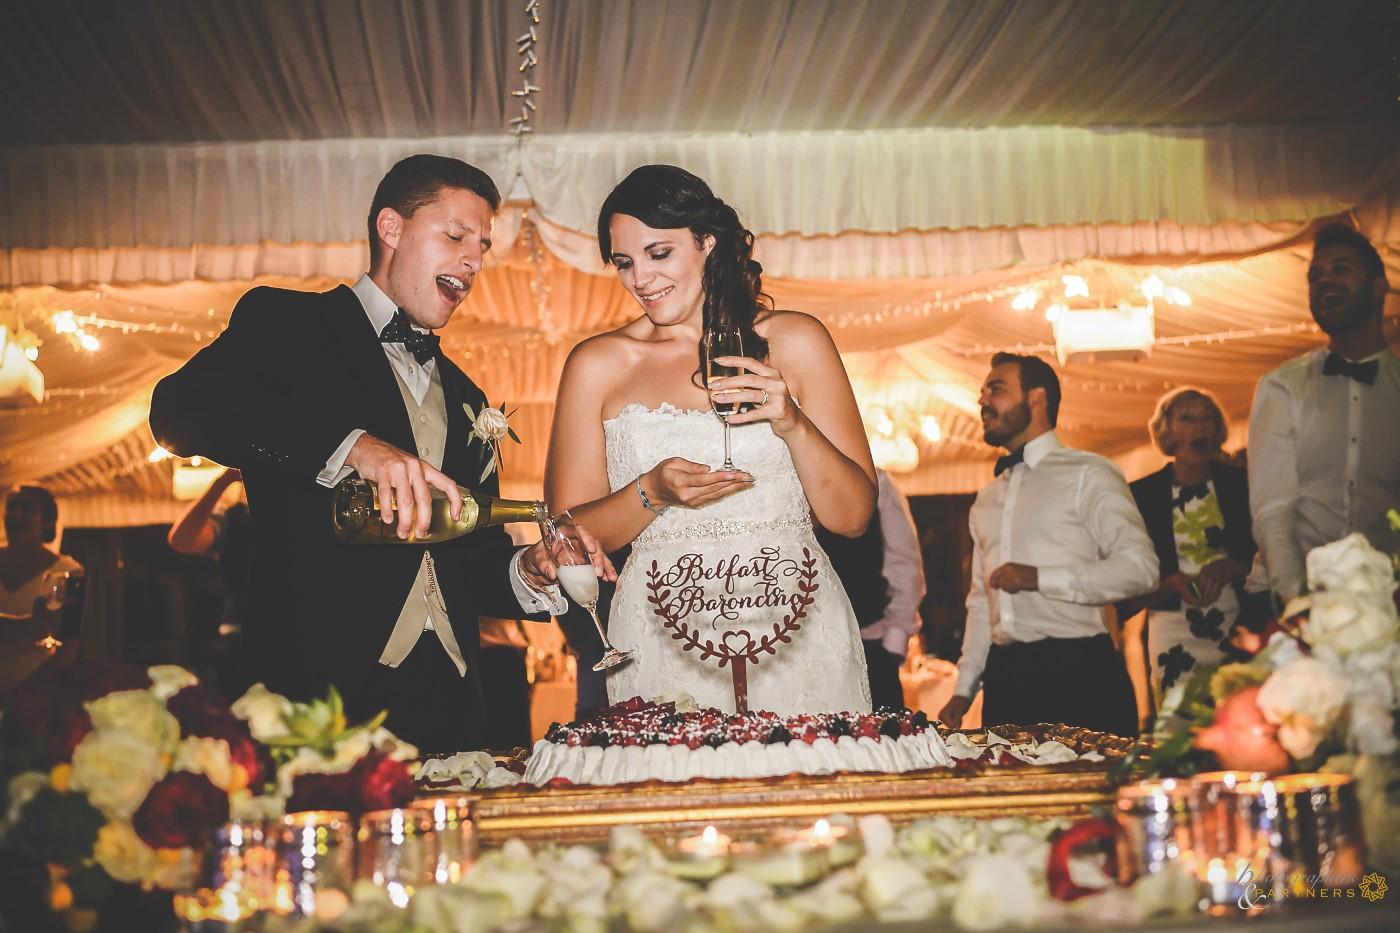 wedding_photography_villa_baroncino_20.jpg